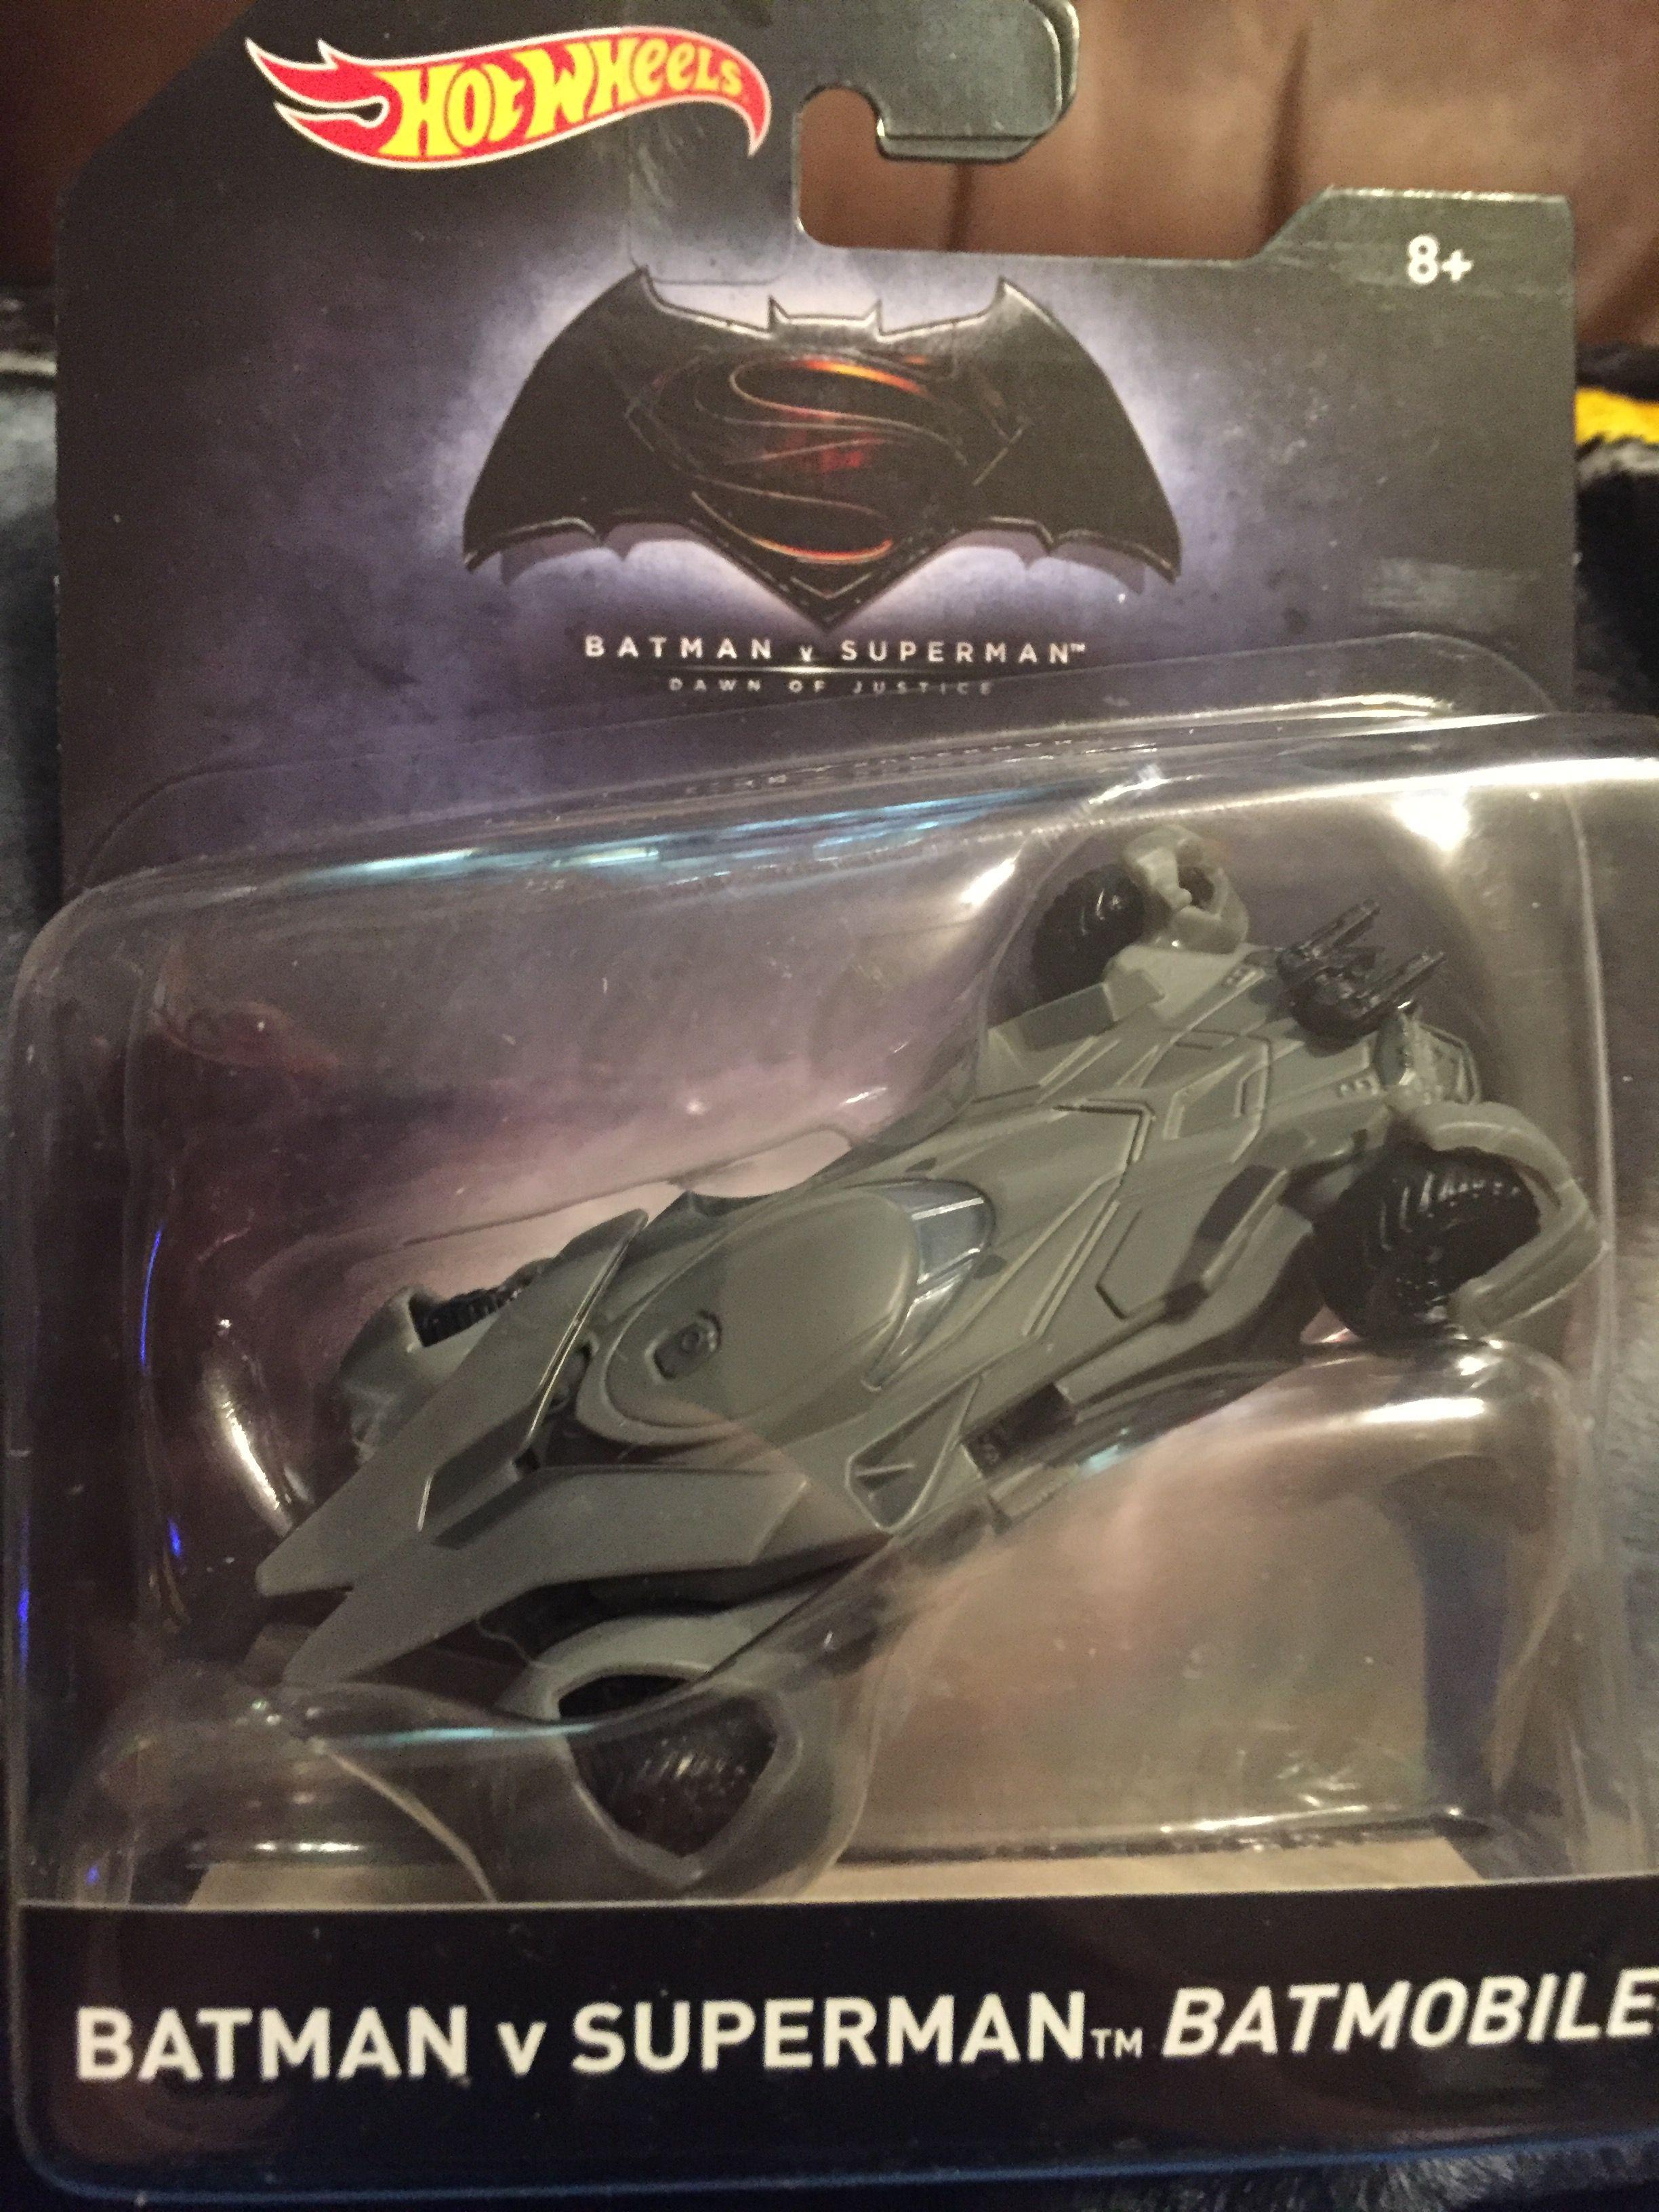 2016 Hot Wheels 1:50 scale Batman vs Superman Batmoblie